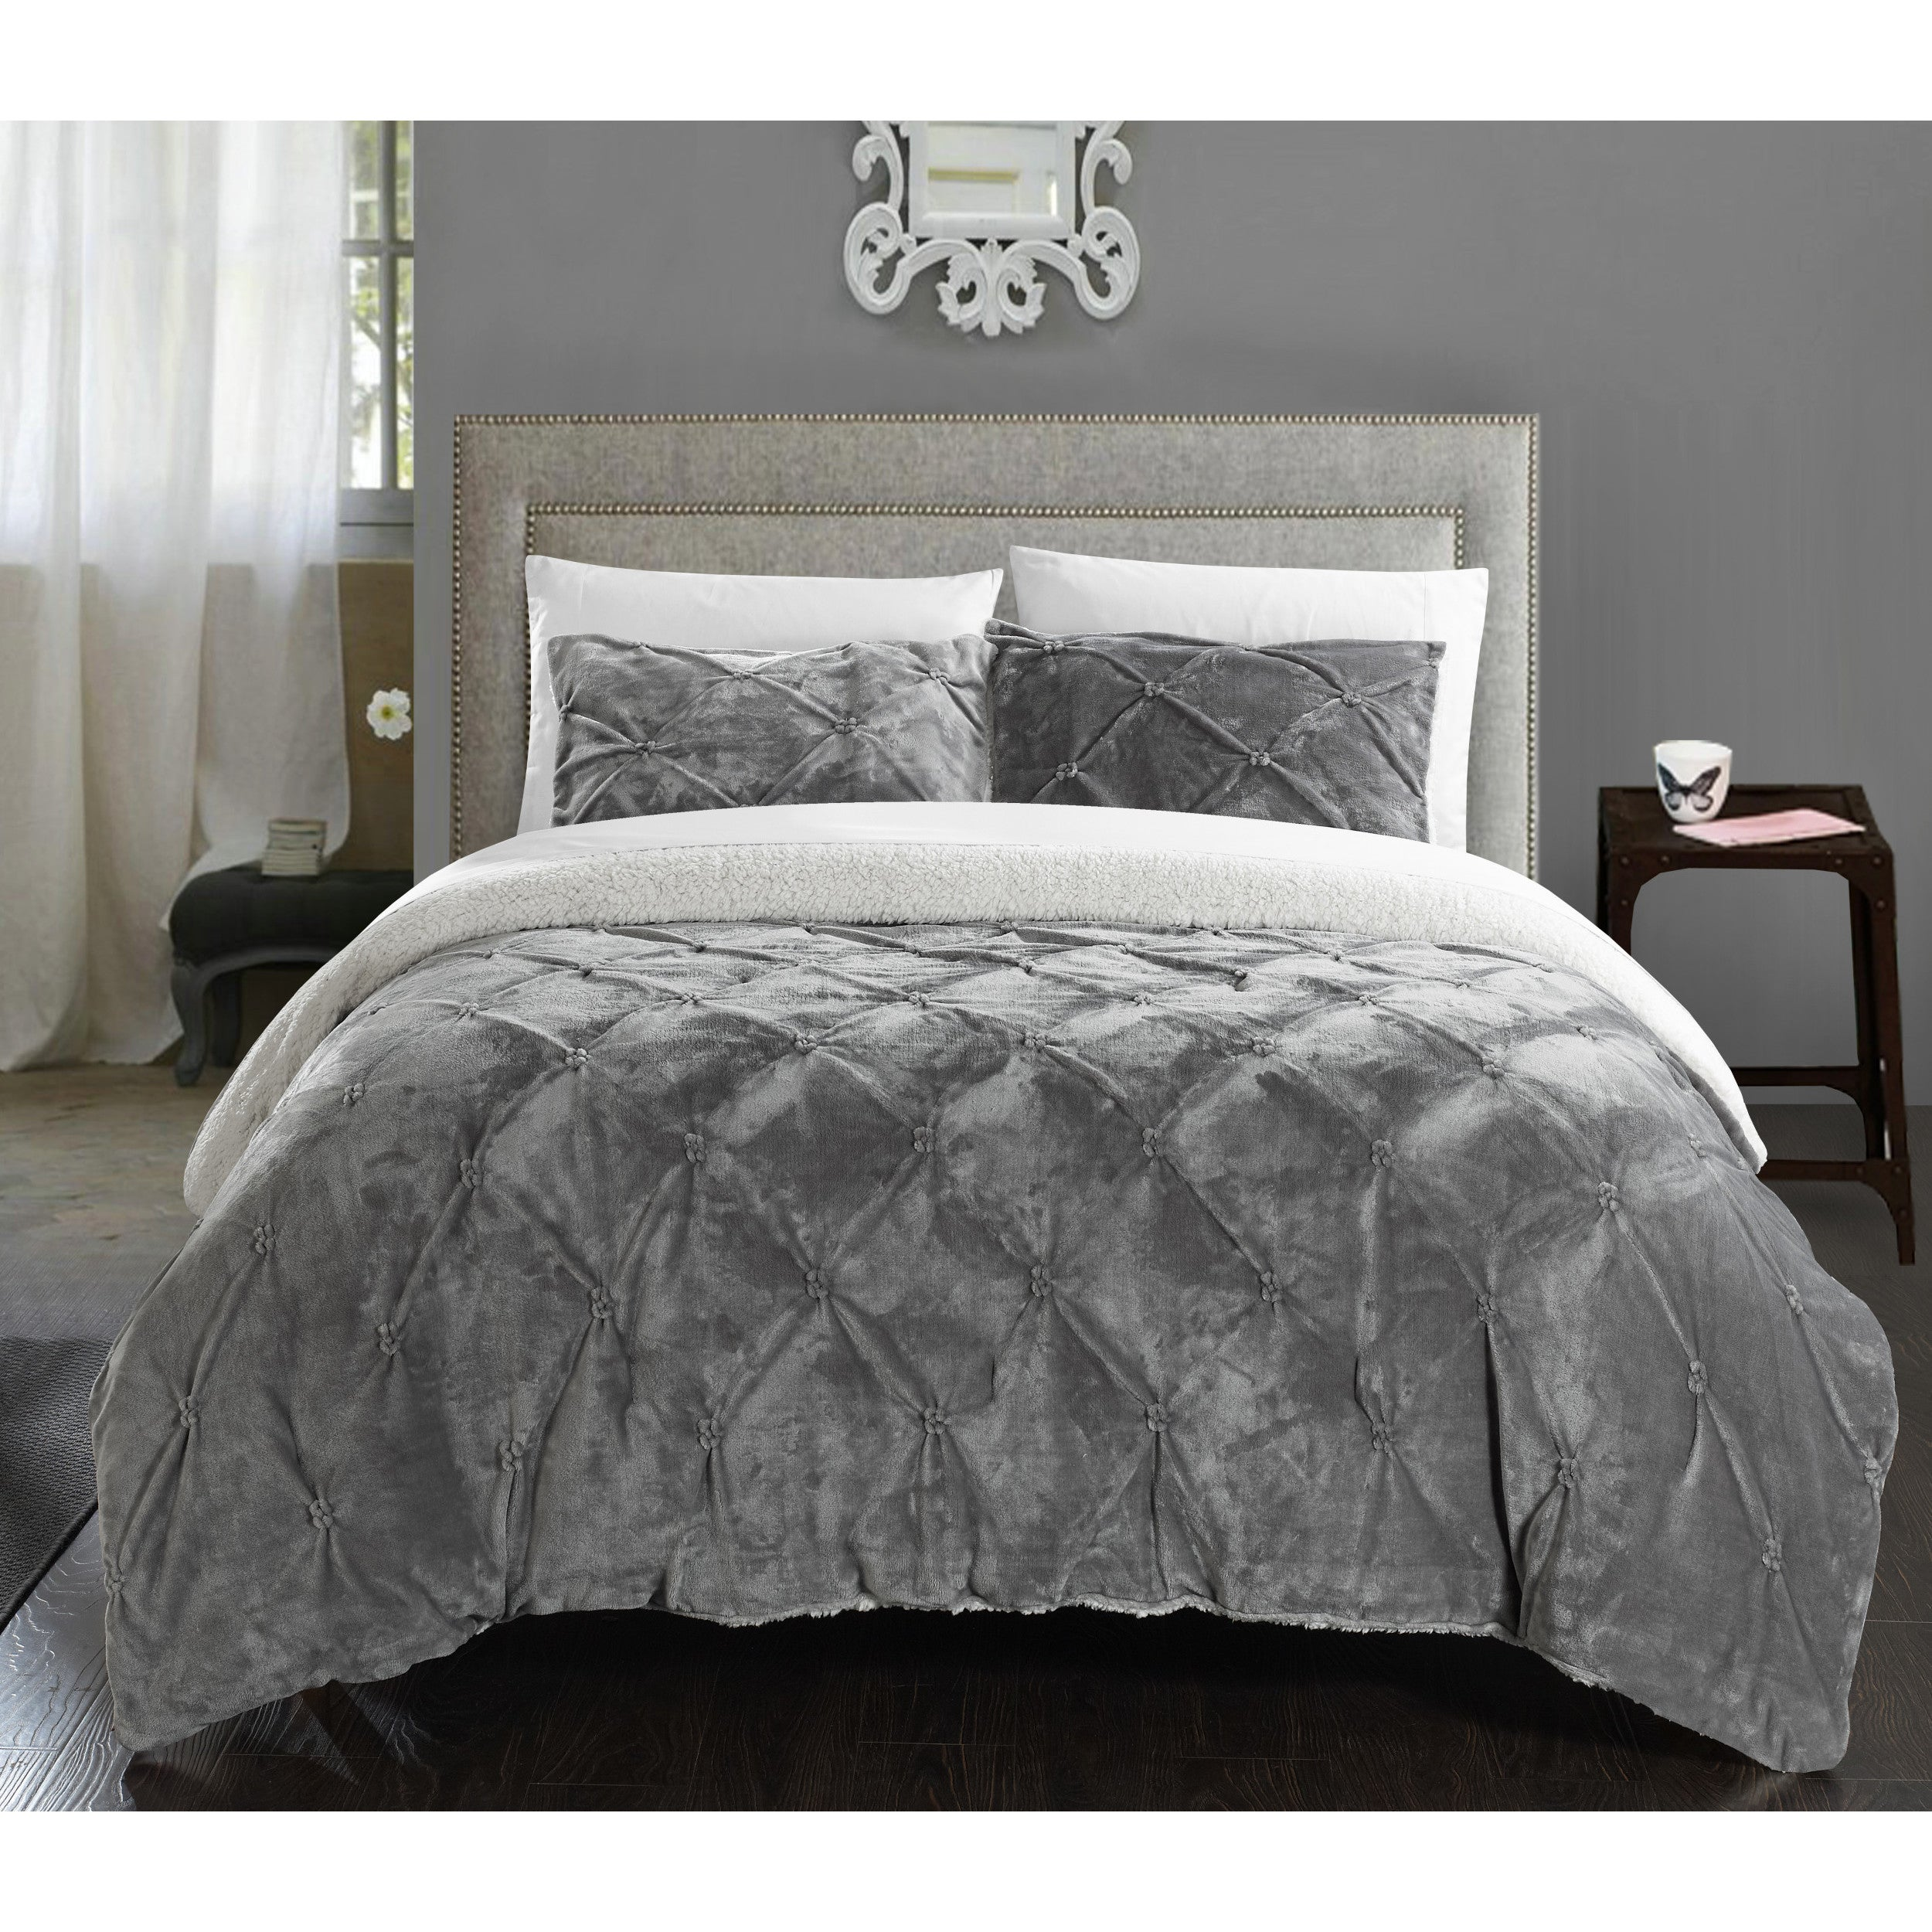 Chic Home Kaiser 7 Piece Comforter Ultra Plush Micro Mink Bedding Set Grey On Sale Overstock 17433407